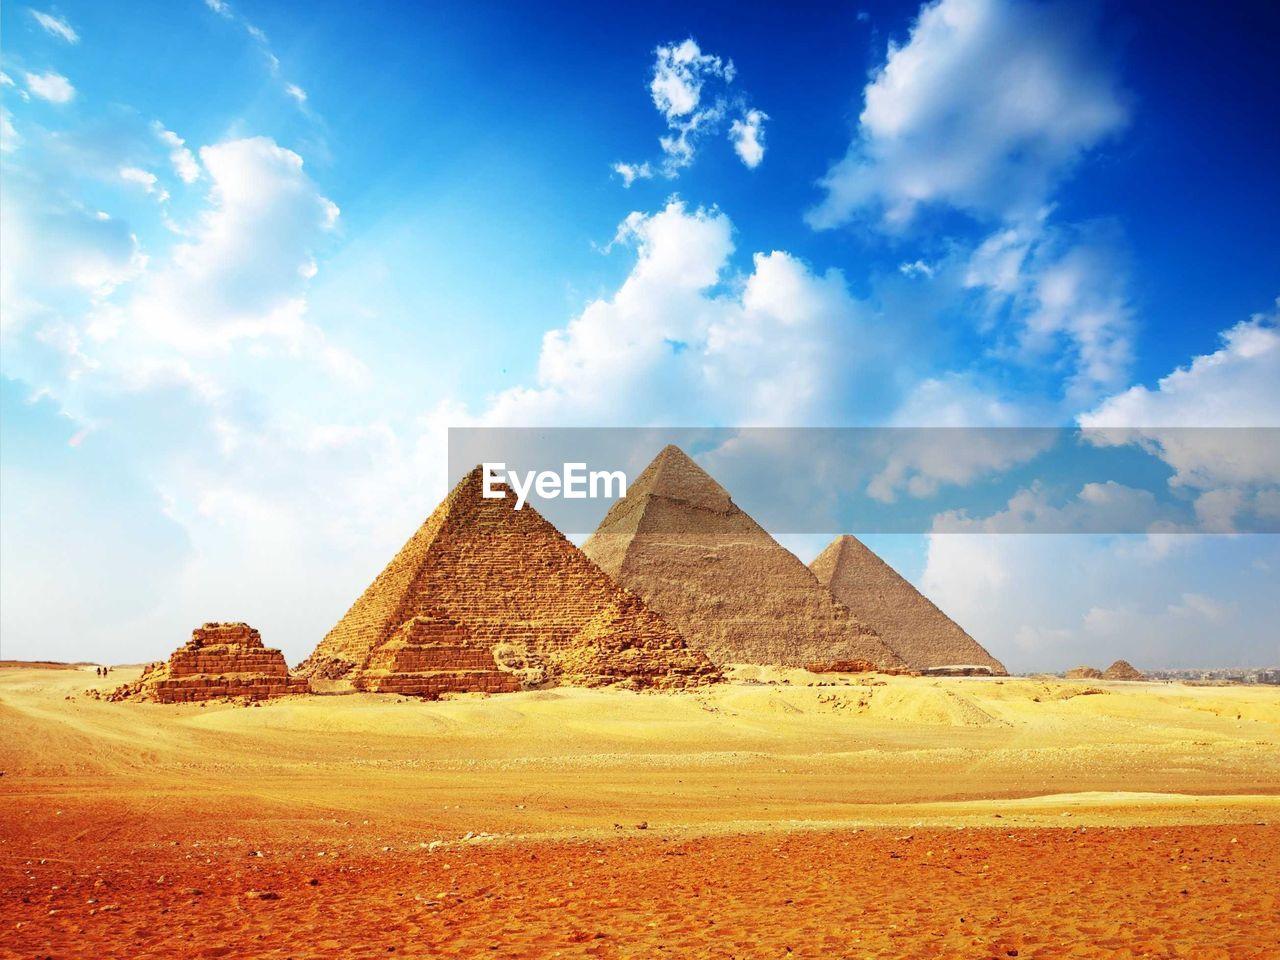 Pyramids in desert against cloudy sky